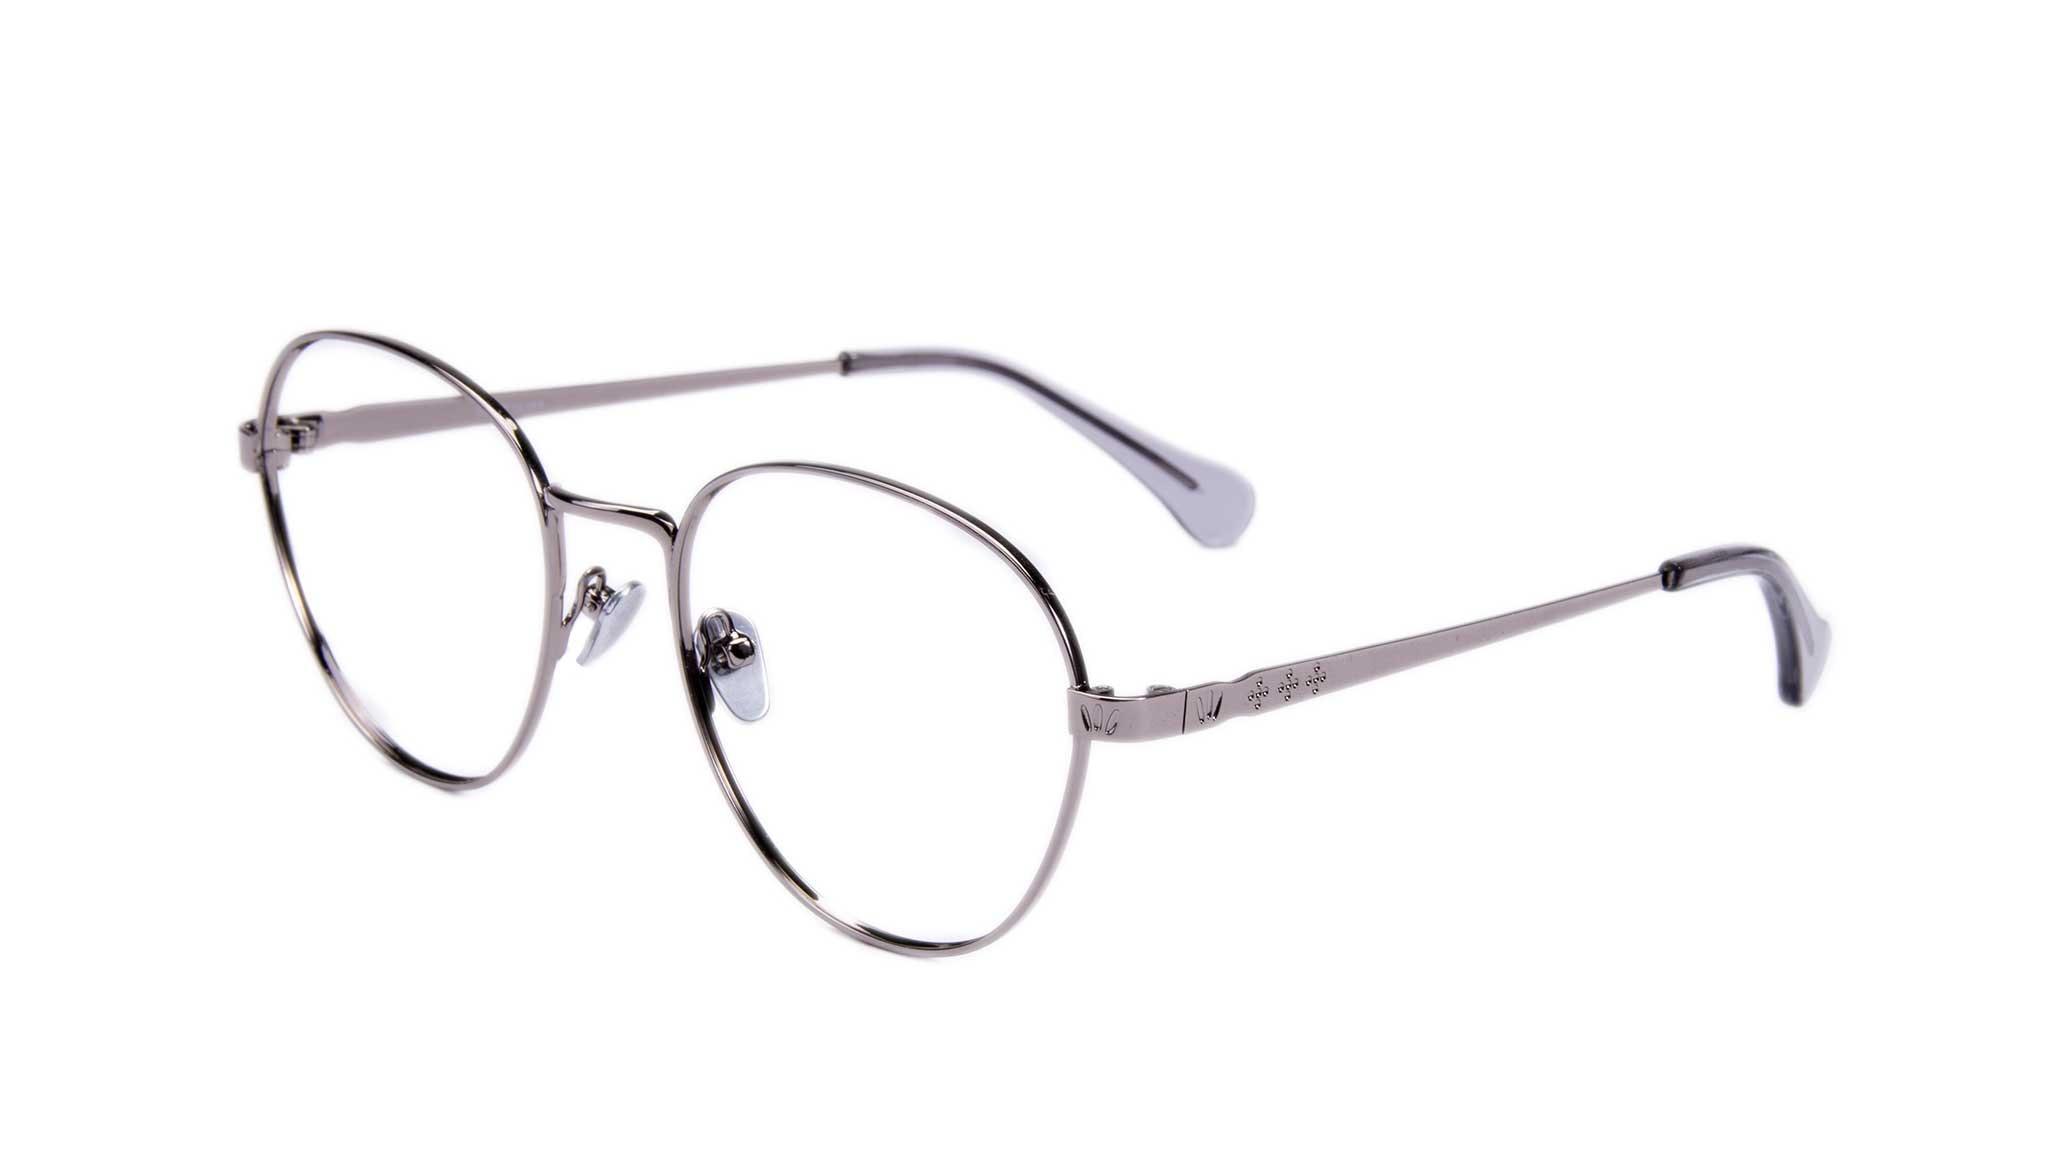 Affordable Fashion Glasses Round Eyeglasses Women Brace Silver Tilt